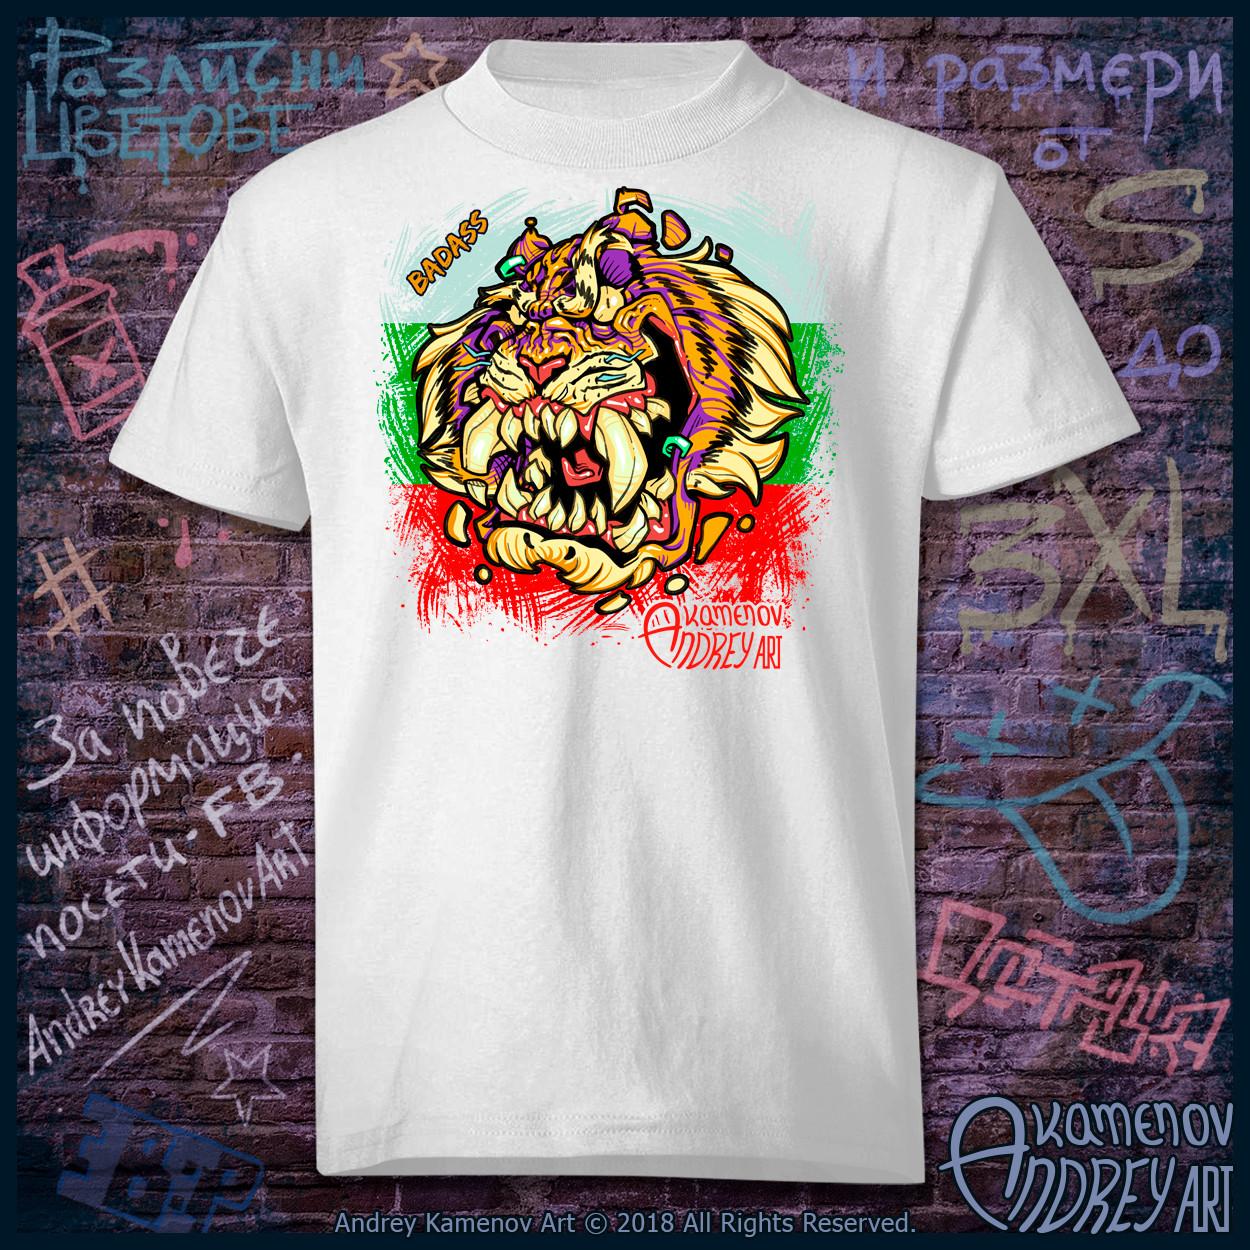 Andrey kamenov badass tiger t shirt bg 02